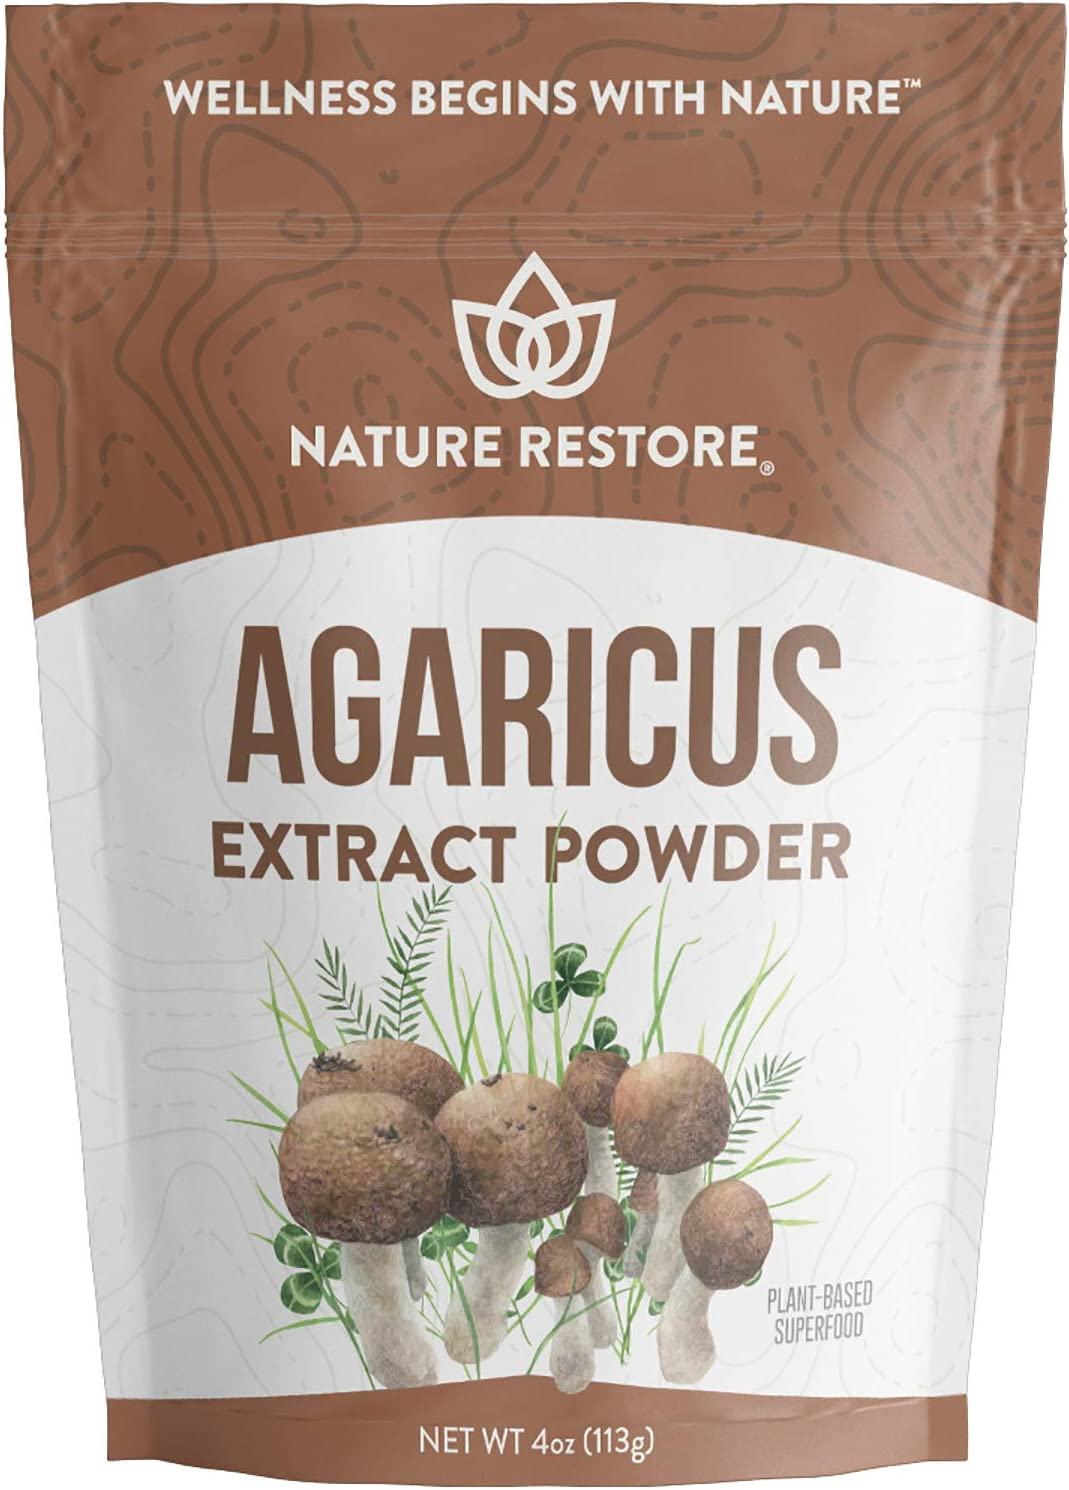 Agaricus Blazei Murill Extract Mushroom Powder, 4 Ounces, 40% Polysaccharides, Non GMO, Gluten Free